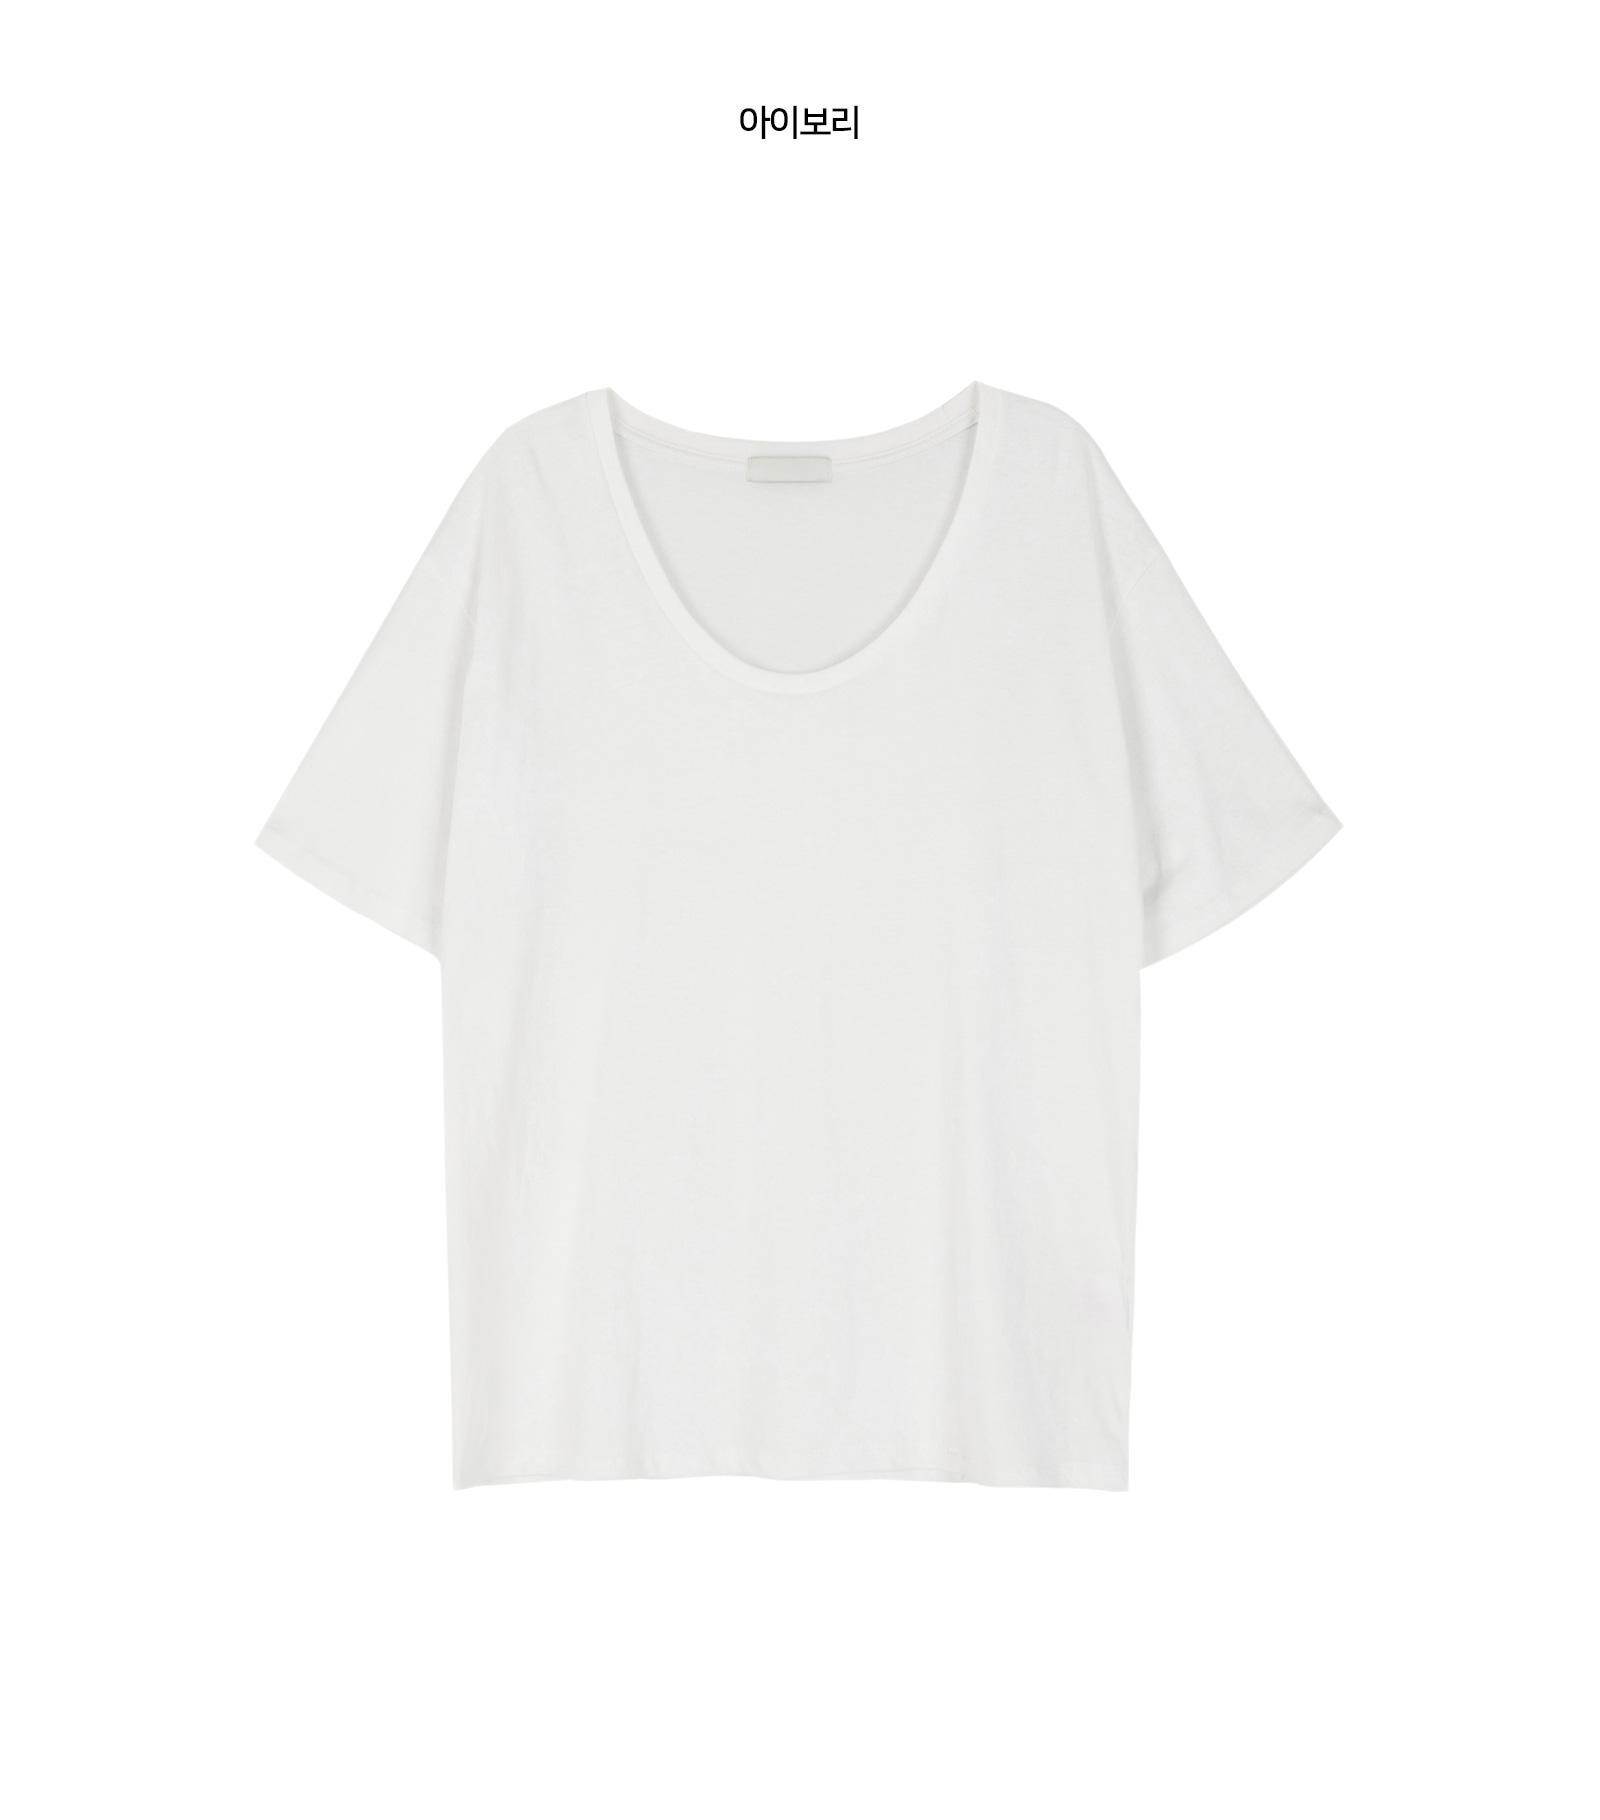 Soft over round neck T-shirt